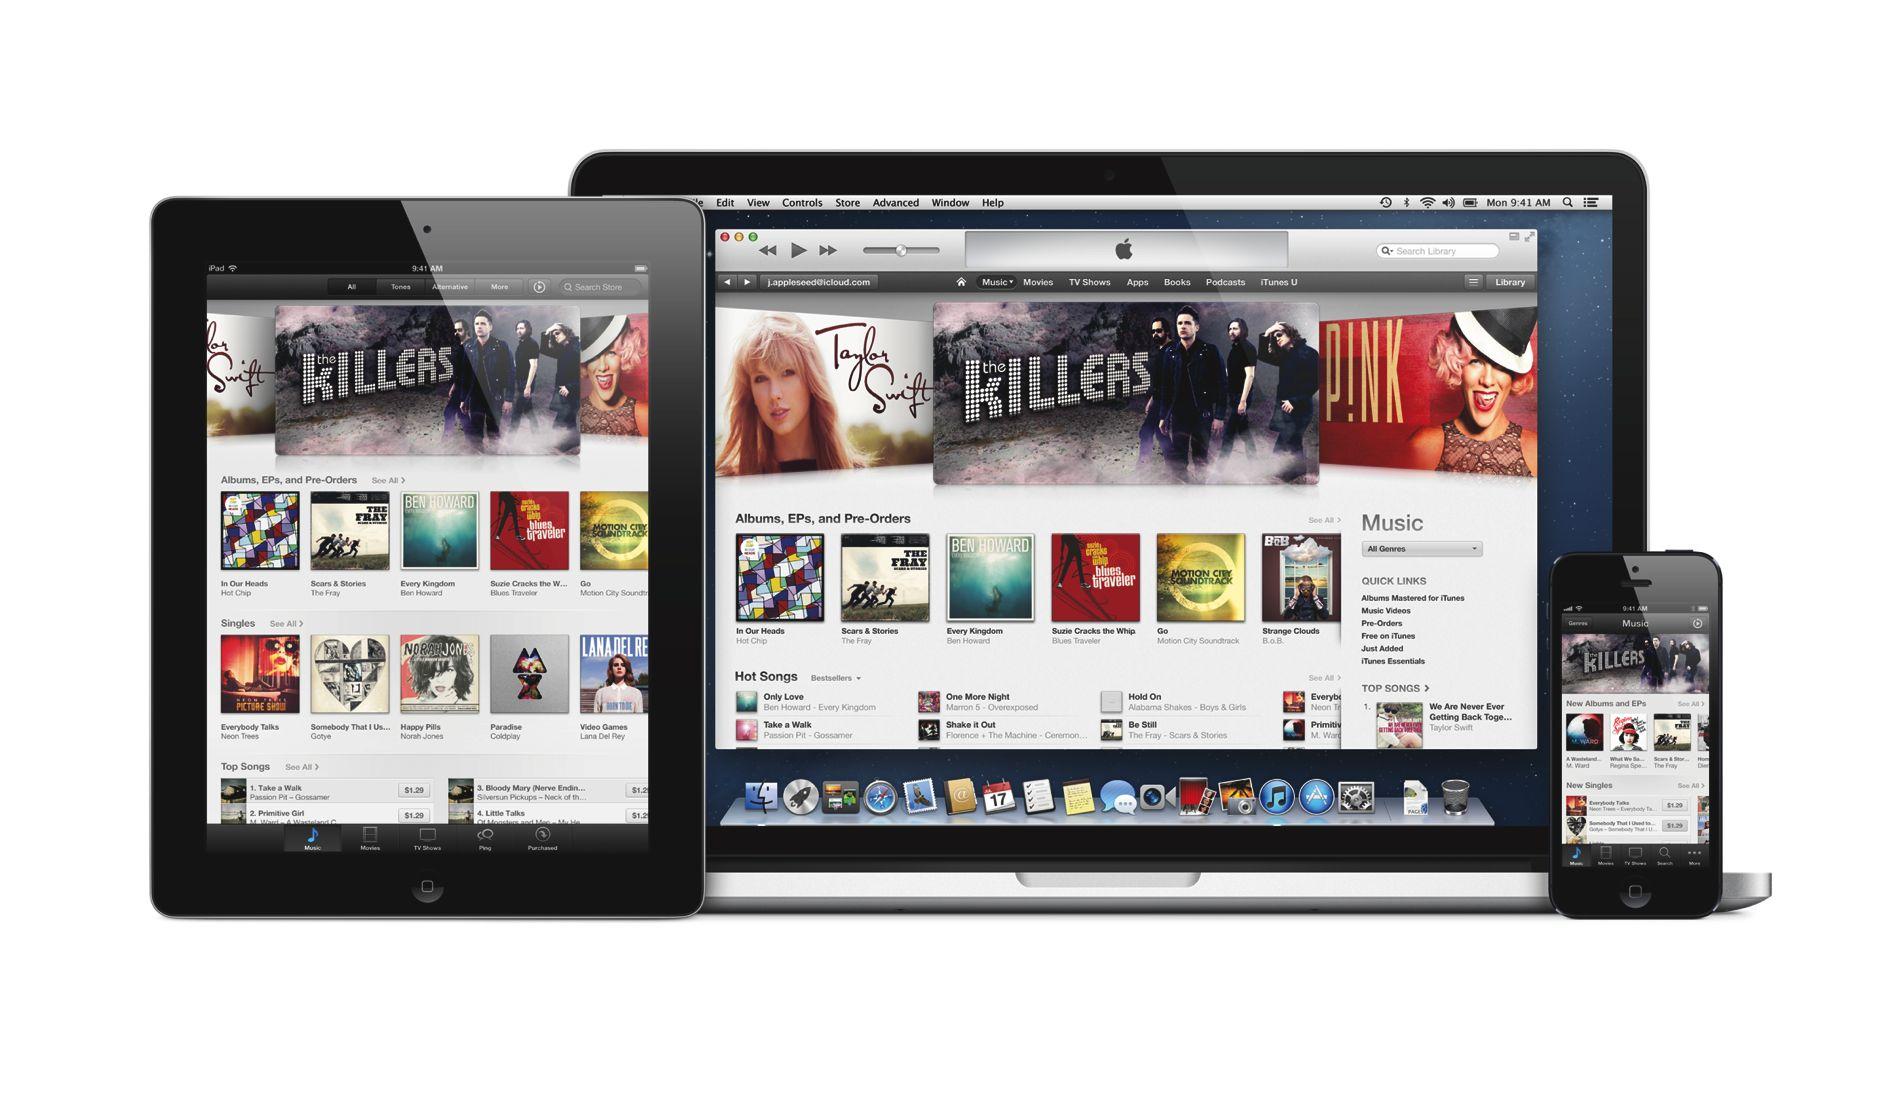 iTunes 11.1 - Download - iOS 7 - Hack4Life